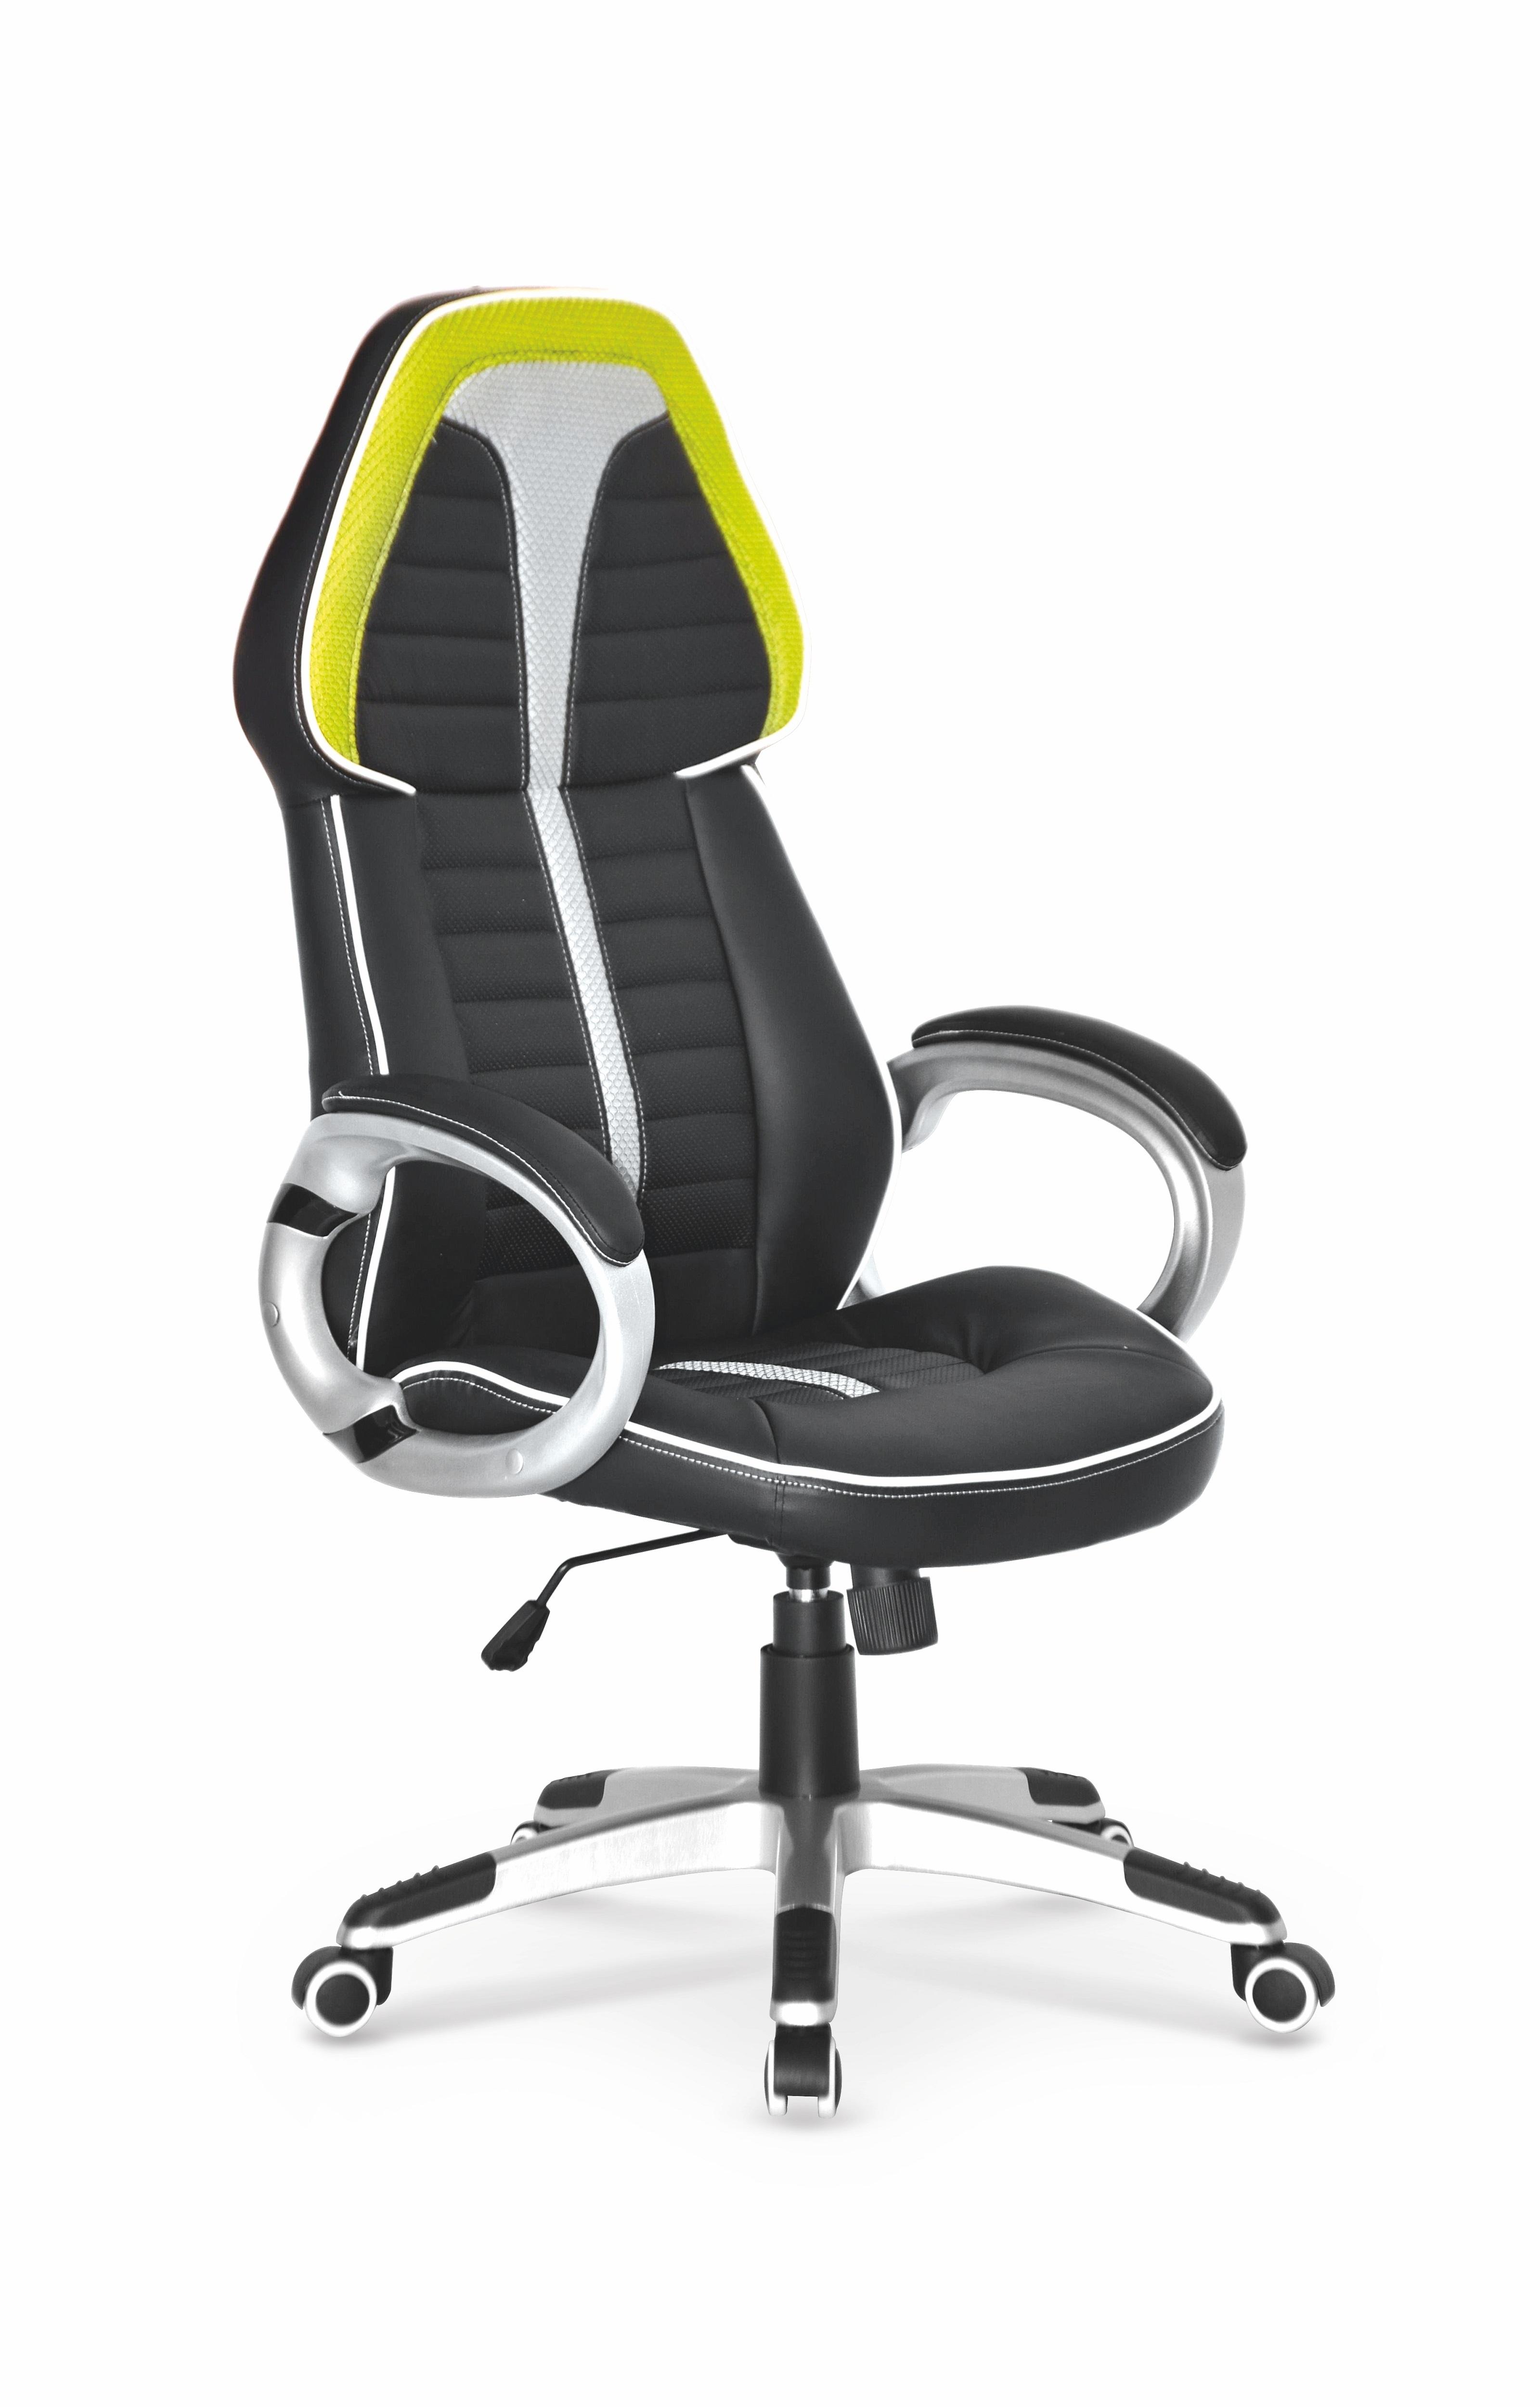 Scaun de birou ergonomic tapitat cu piele ecologica Signet Black / Grey, l64xA75xH115-125 cm somproduct.ro